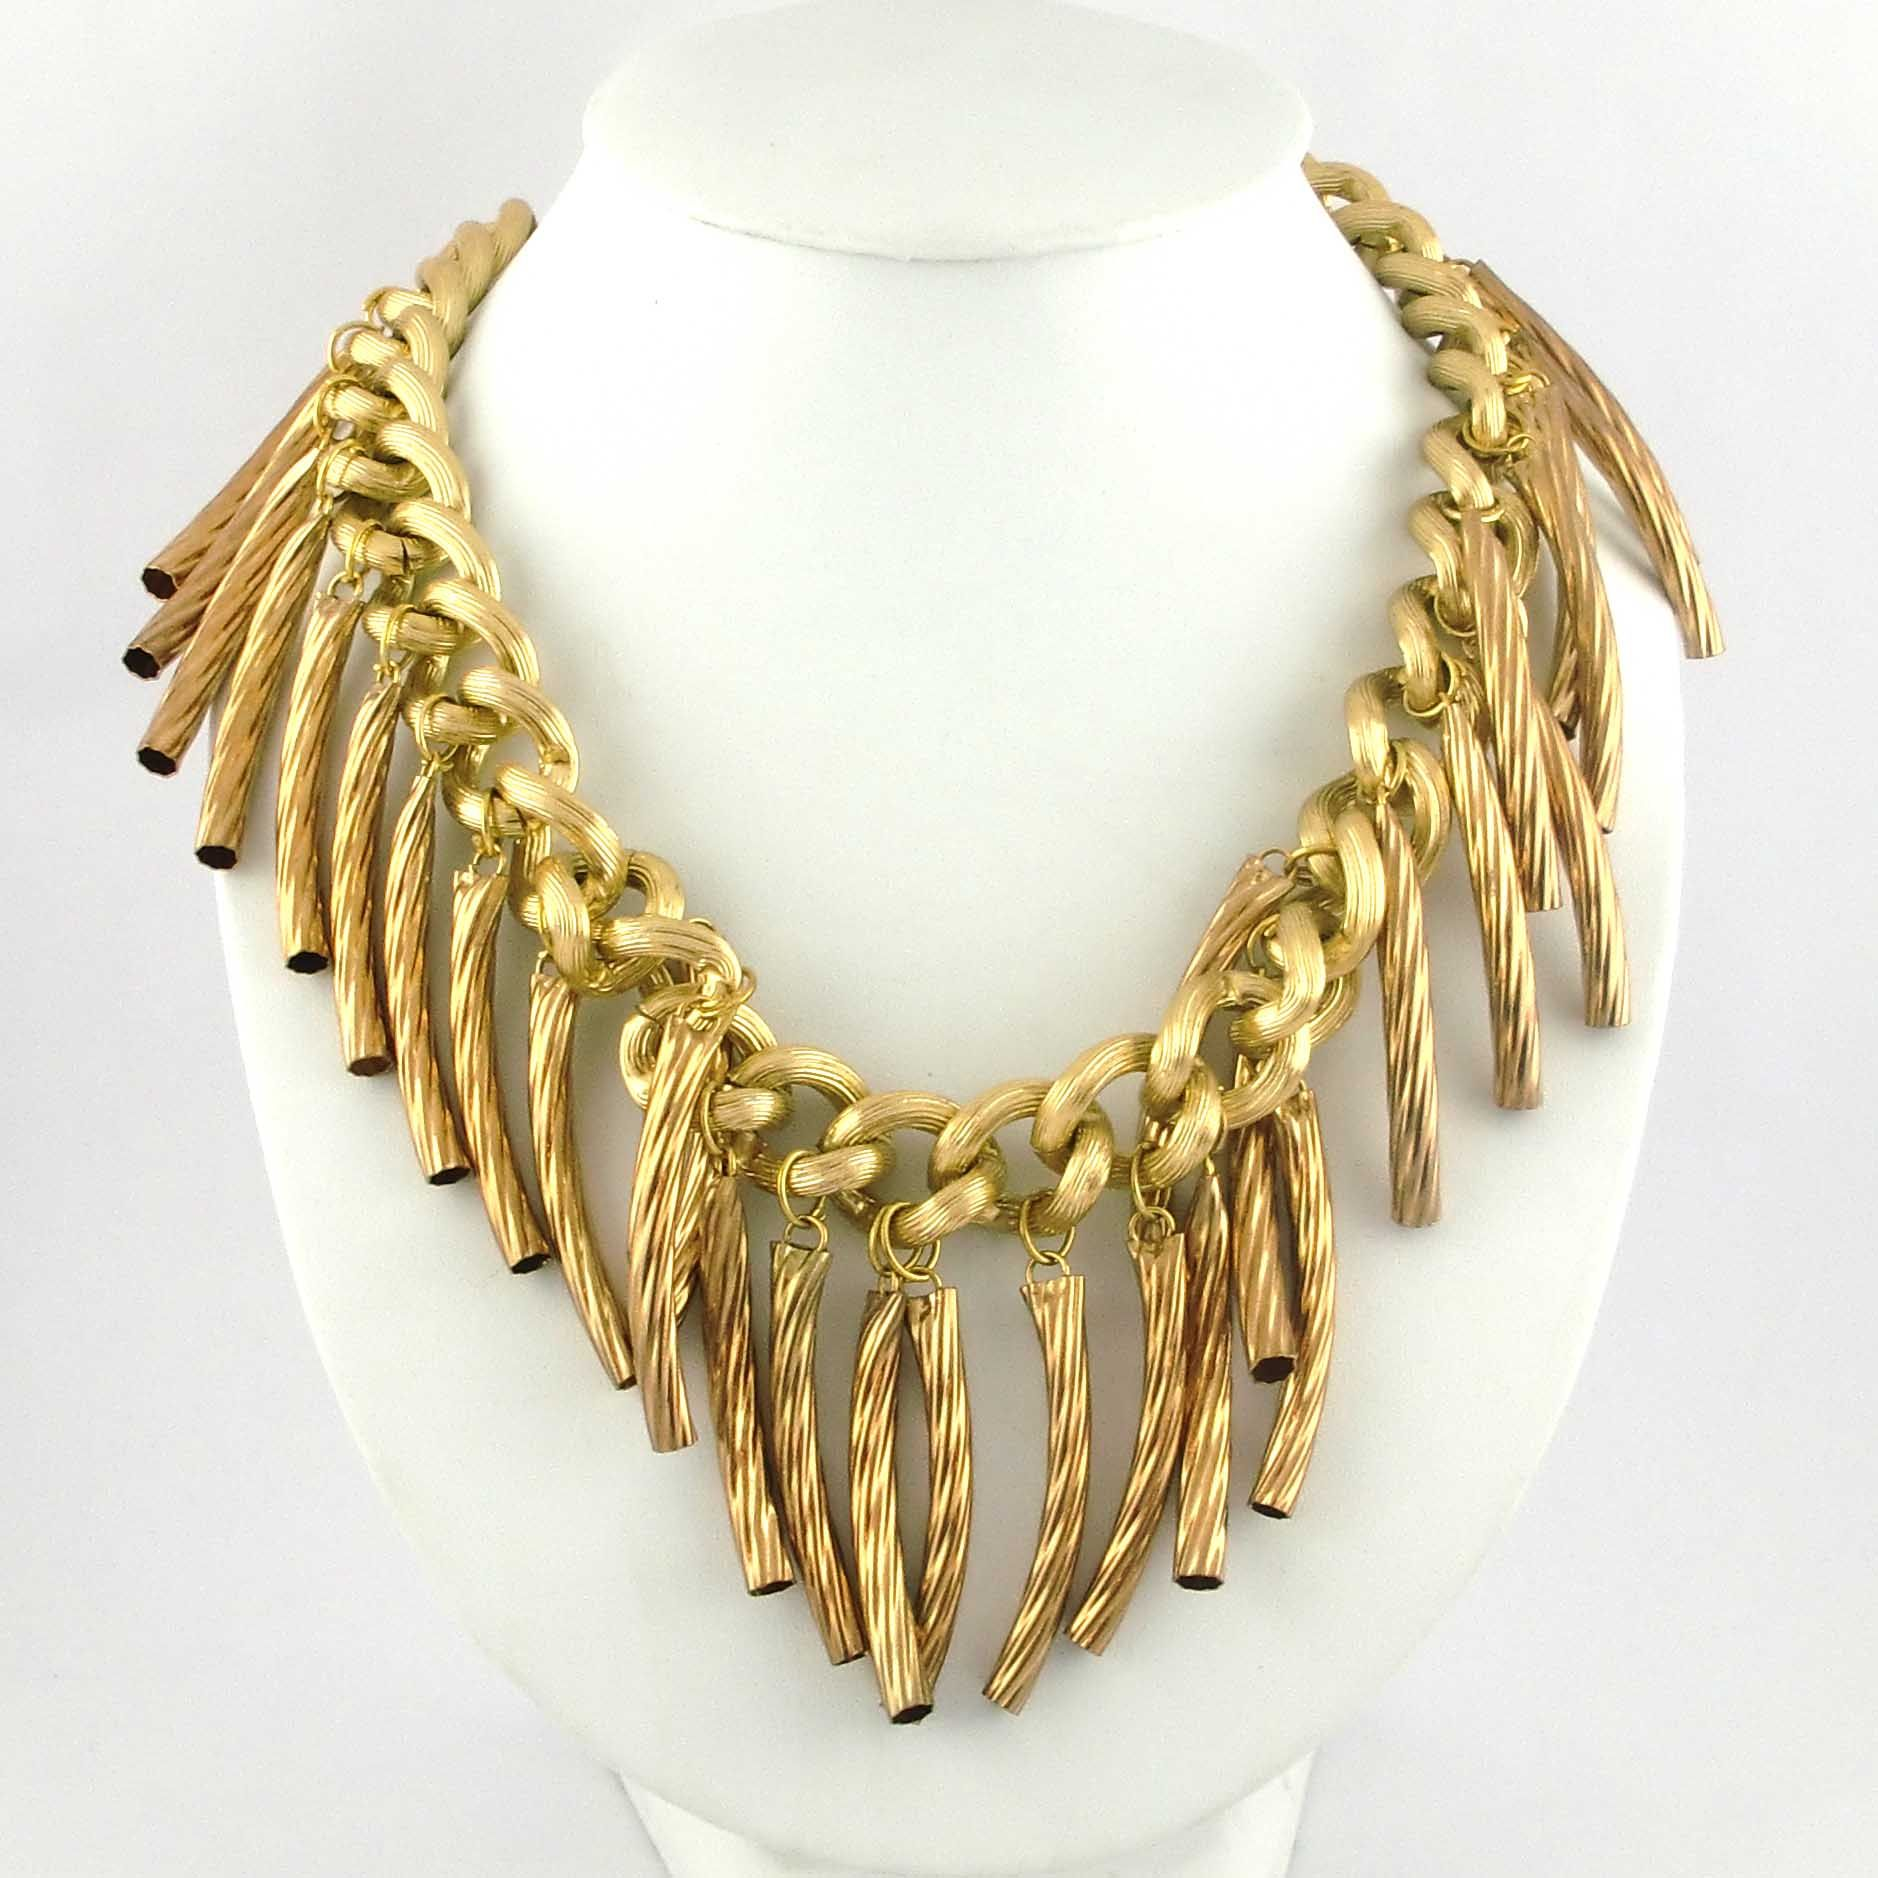 Spectacular gold tube chu necklace